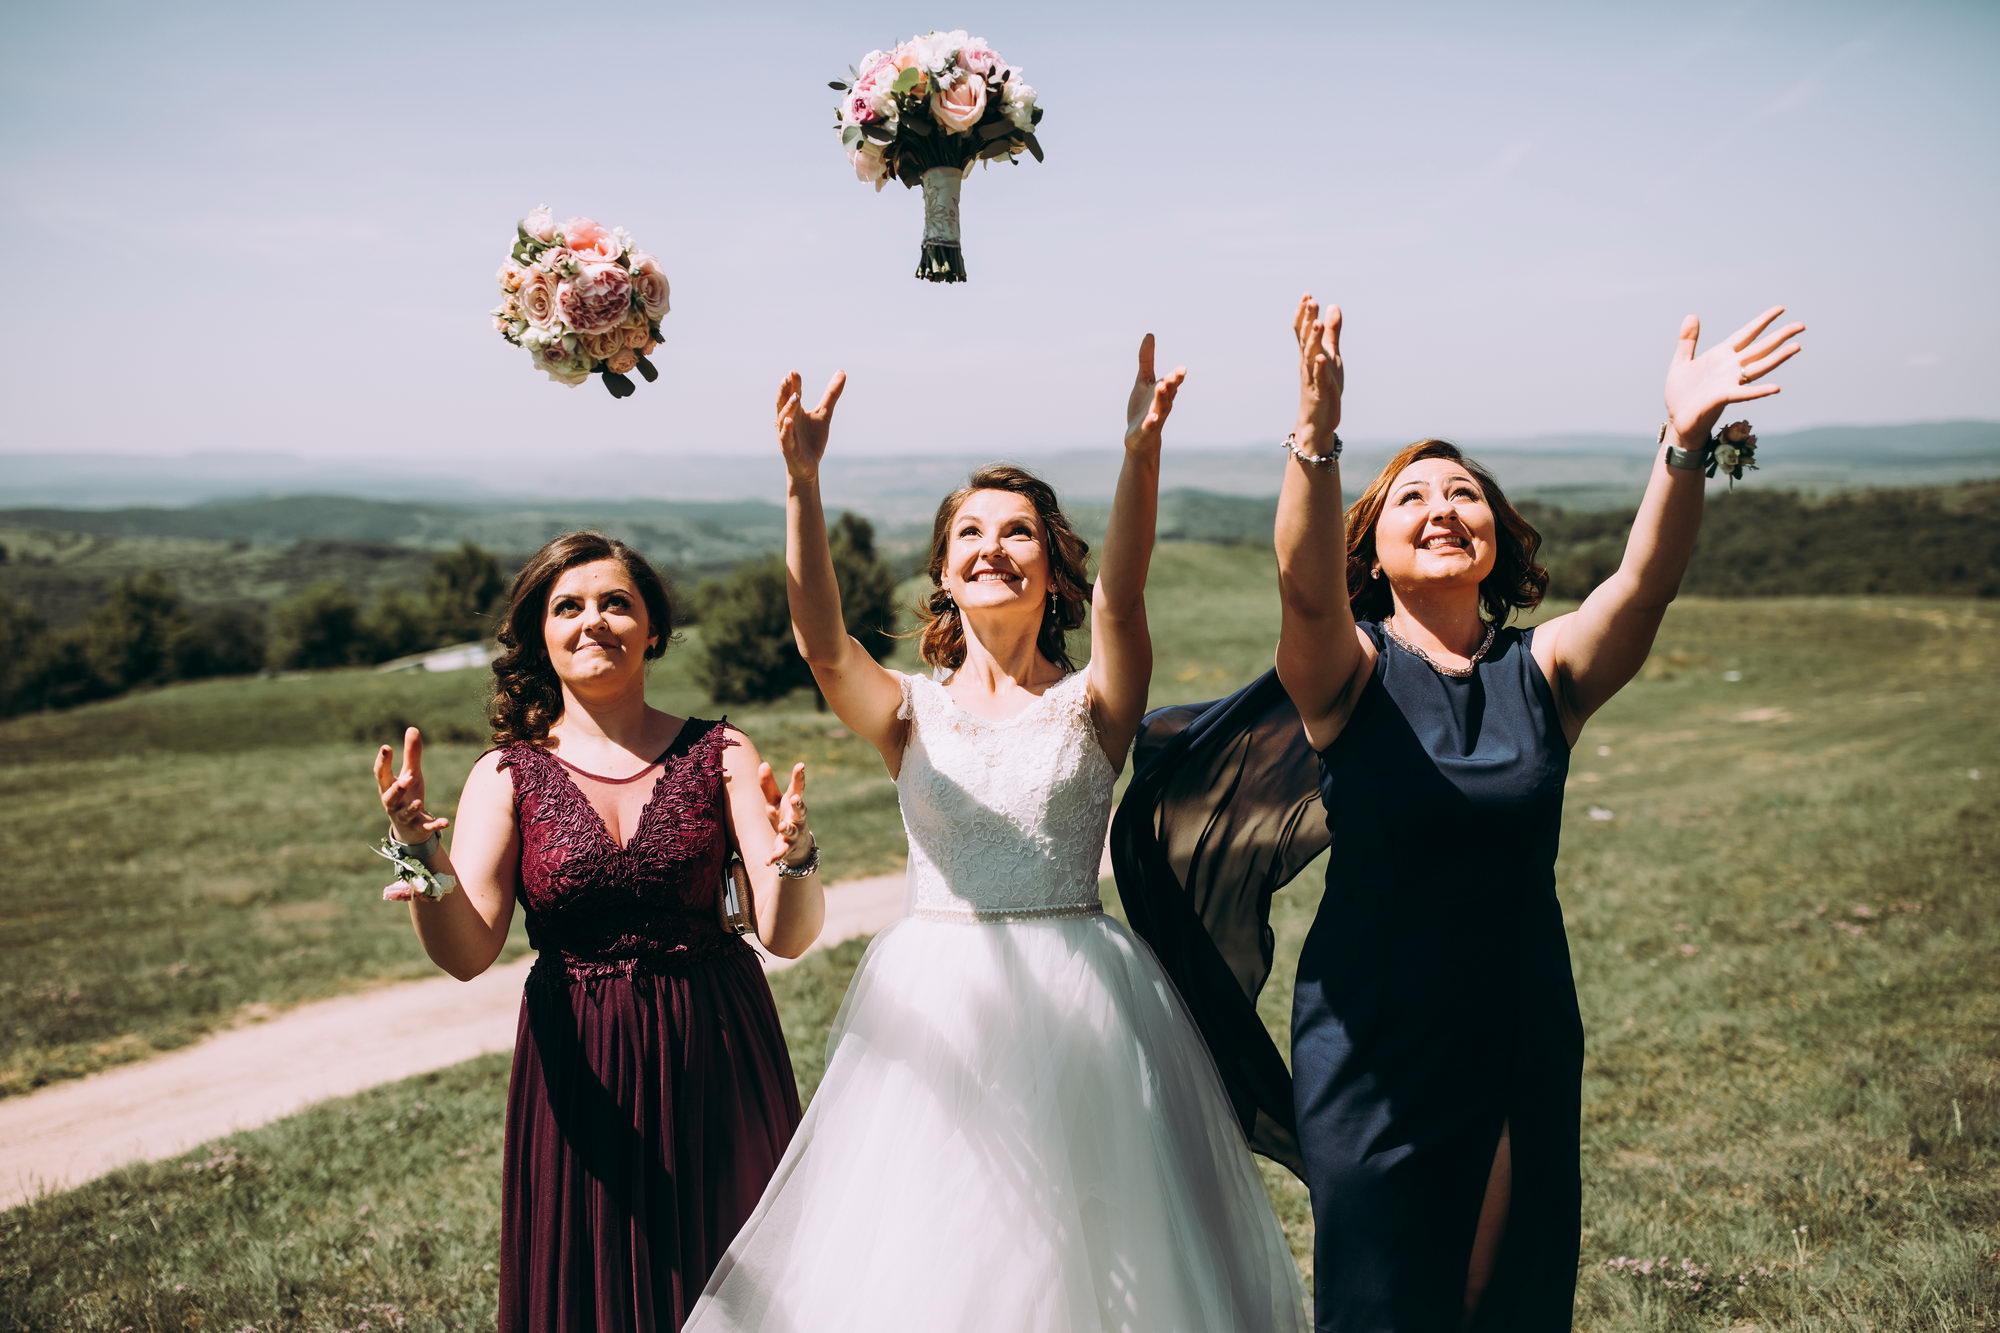 Fotografie din ziua nuntii in Cluj